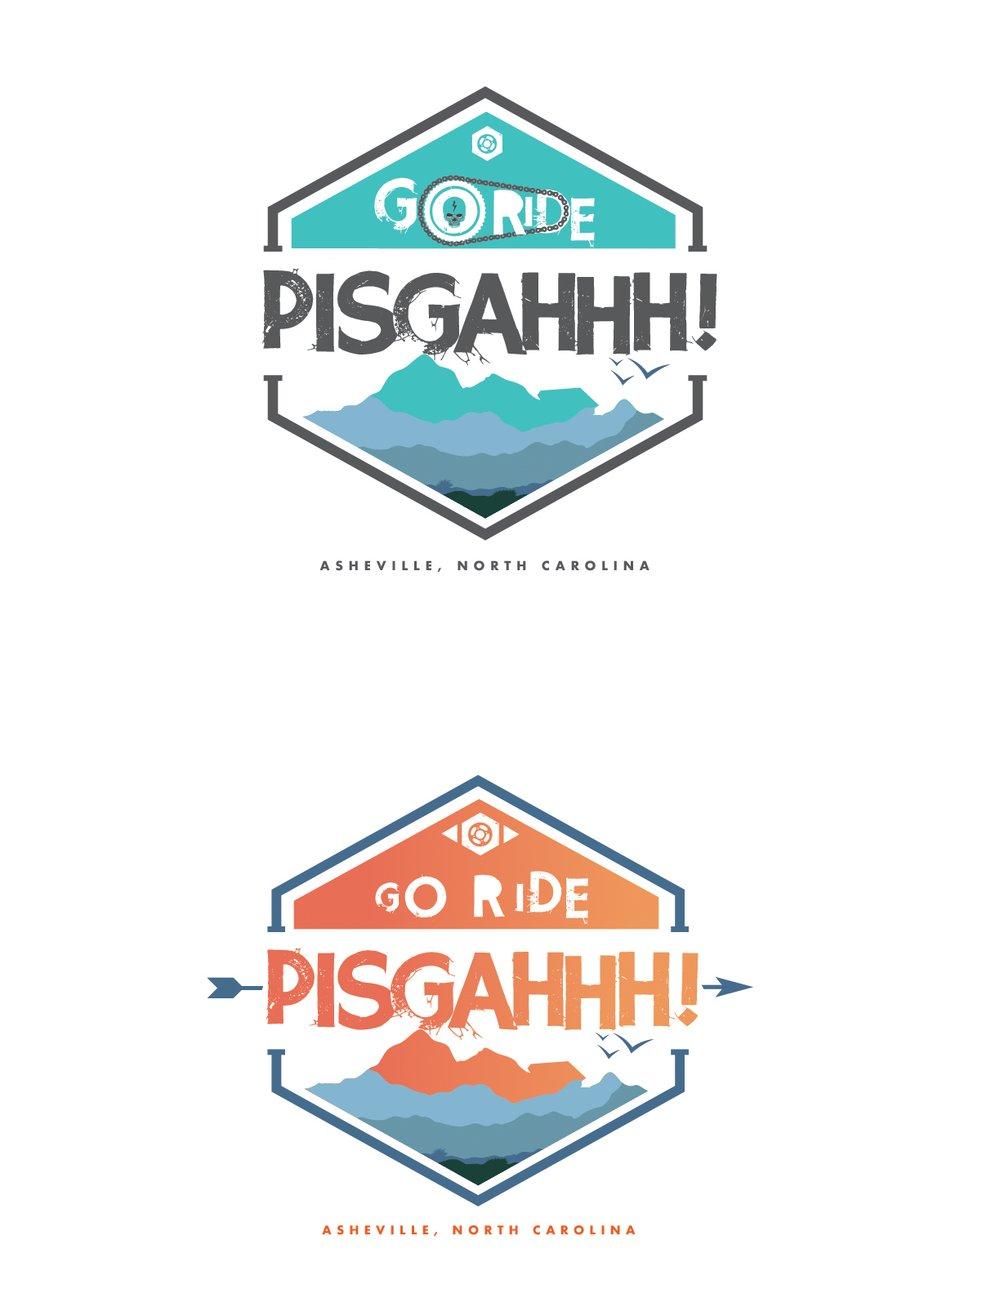 Go Ride Pisgahhh!